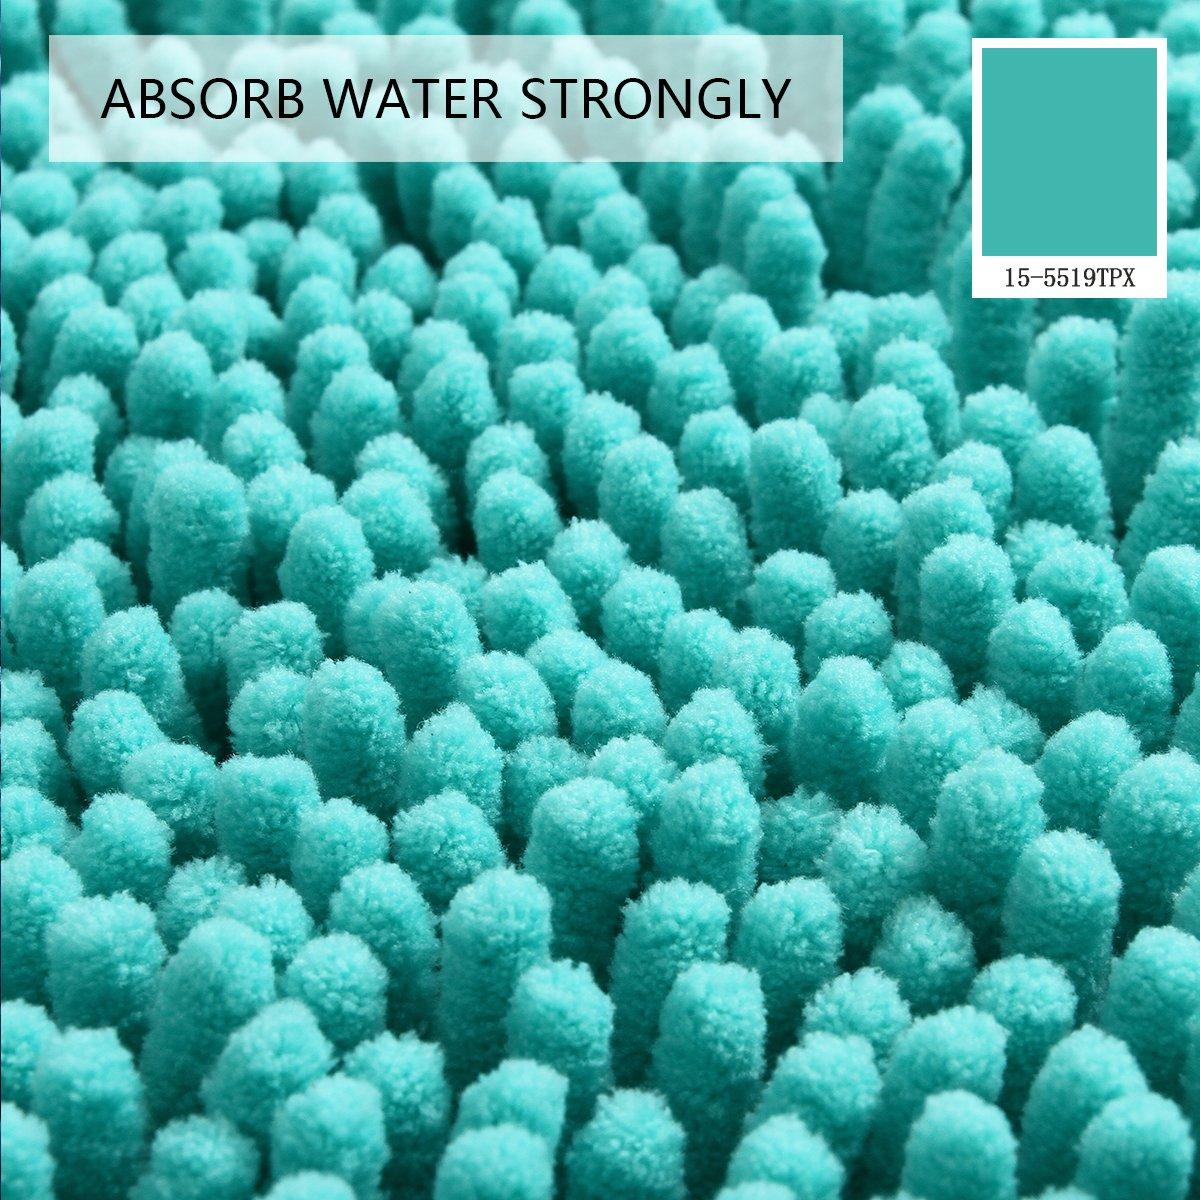 Mayshine Bath mats for Bathroom Rugs Non Slip Machine Washable Soft Microfiber 2 Pack (20×32 inches, Turquoise) by MAYSHINE (Image #3)